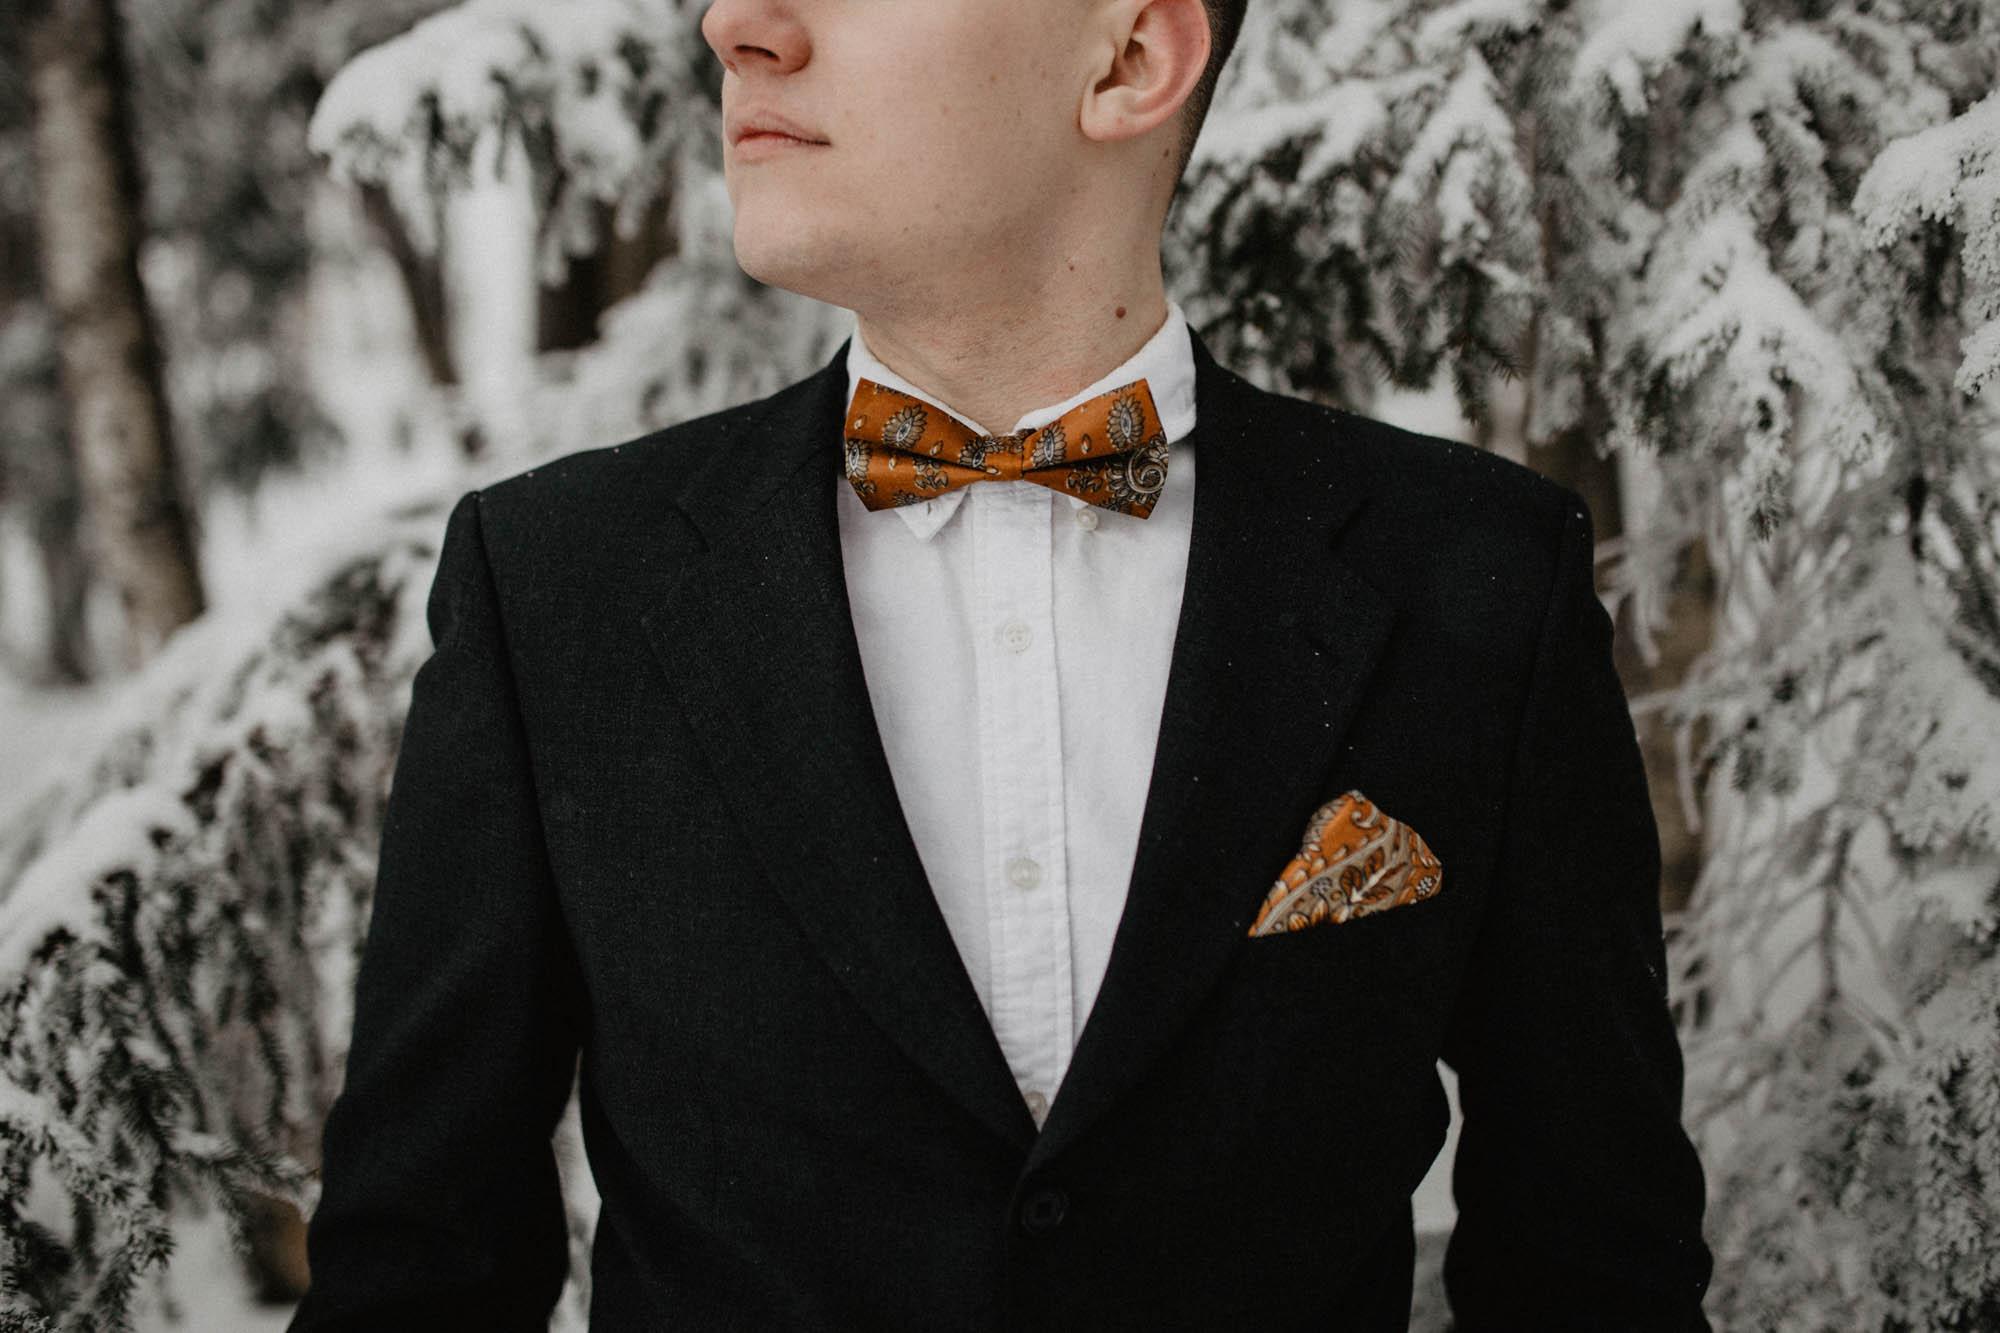 ashley_schulman_photography-winter_wedding_tampere-27.jpg